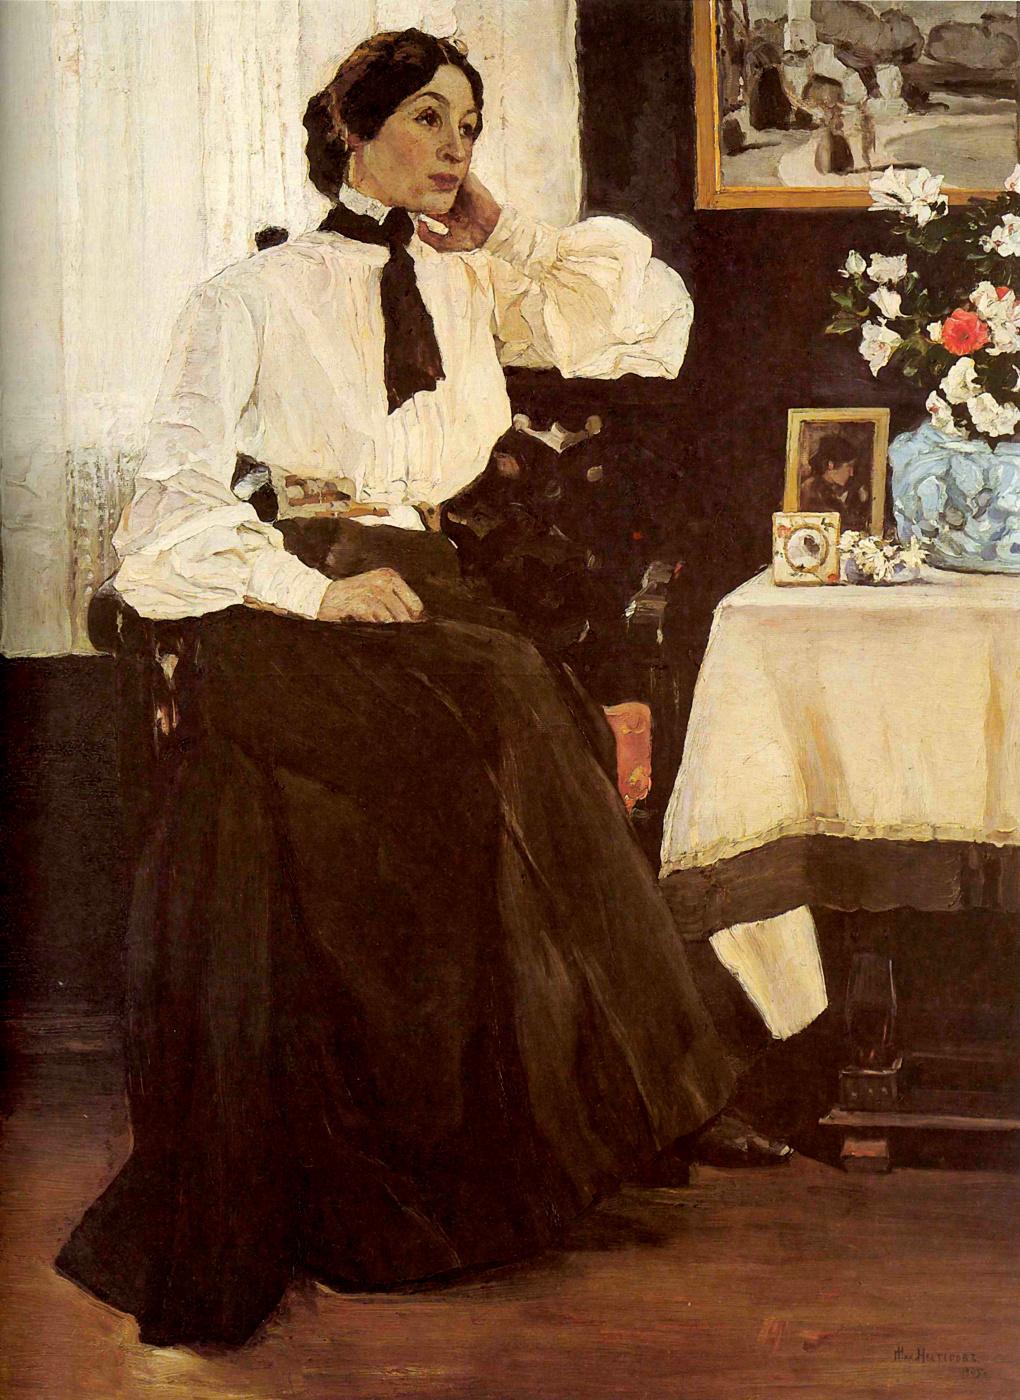 Mikhail Vasilyevich Nesterov. A portrait of his wife, E. P. Nesterova